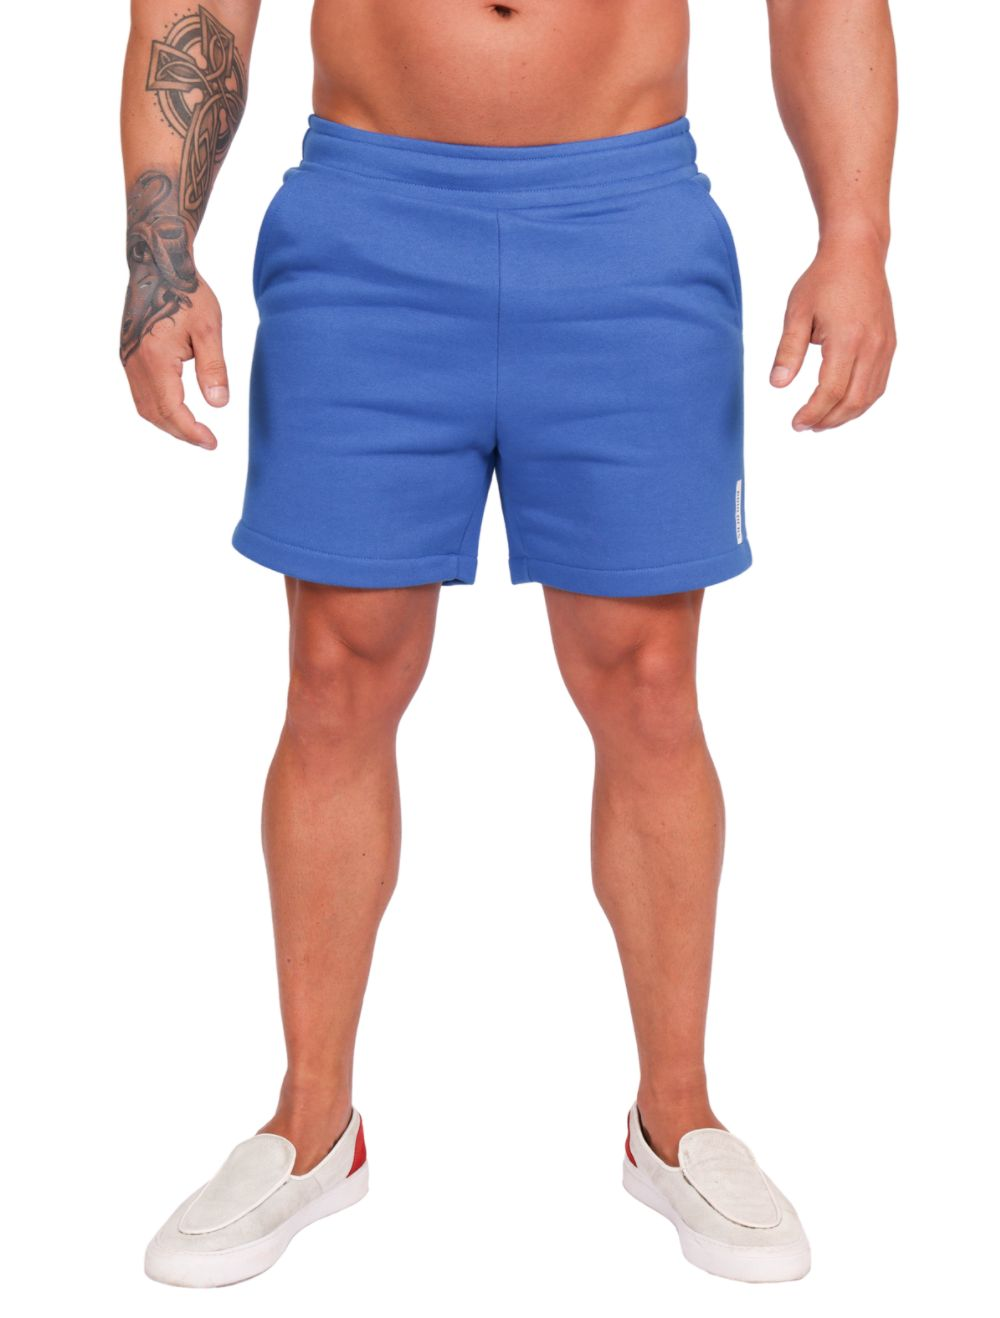 Bermuda Masculina em Moletom Azul Bic